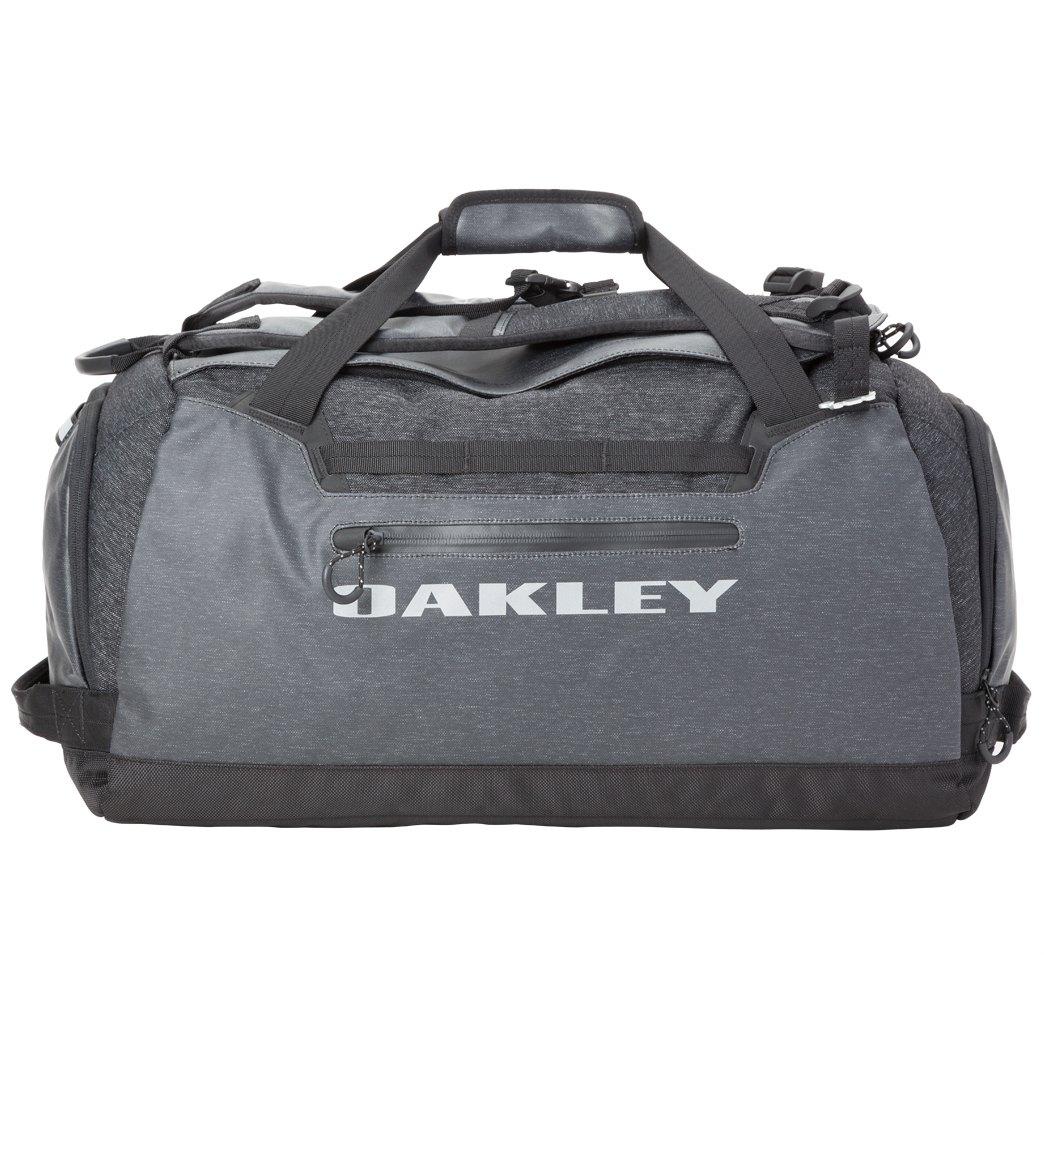 Oakley Men S Voyage Duffel Bag At Swimoutlet Free Shipping